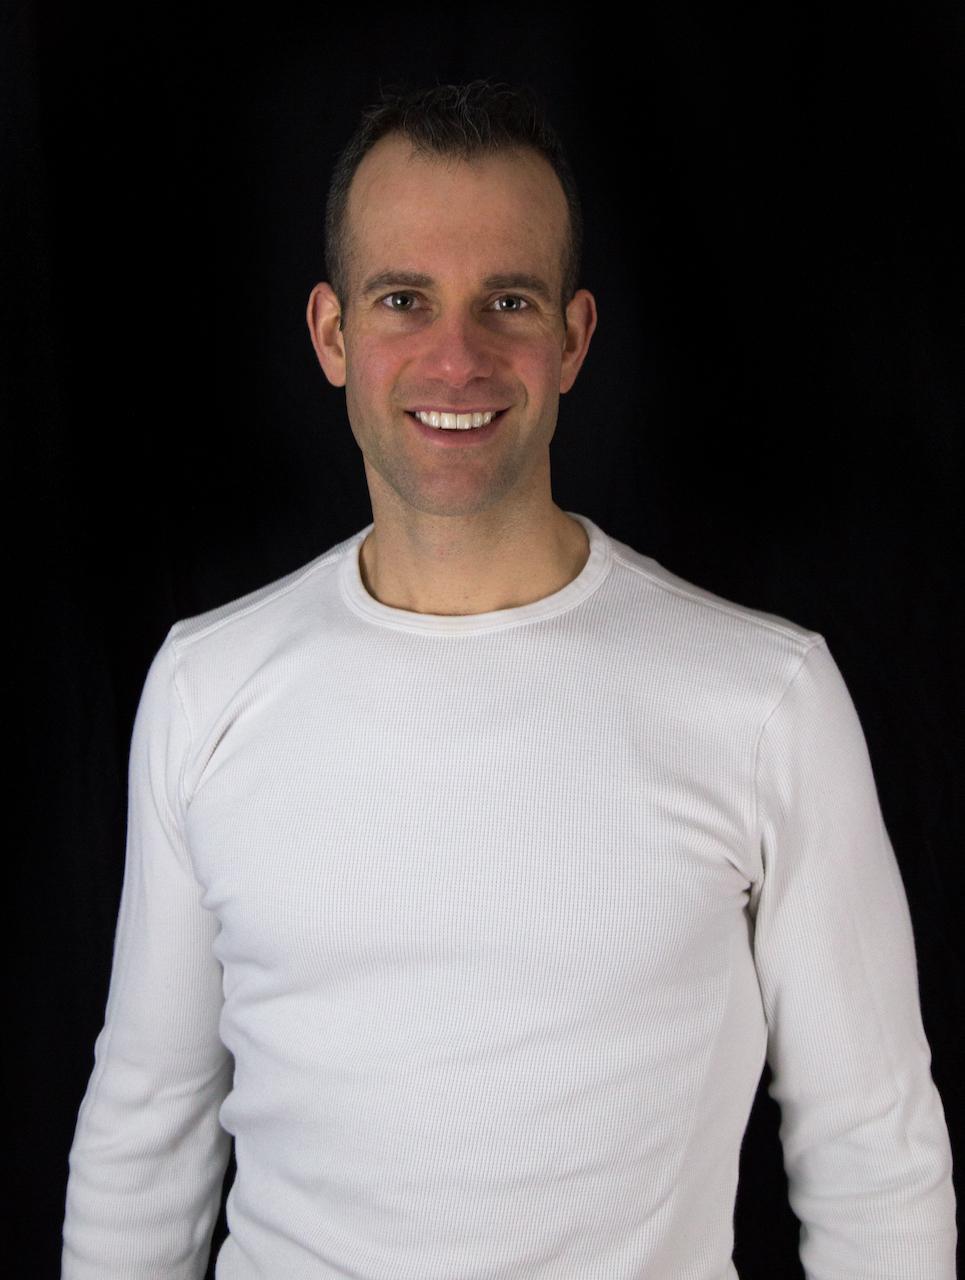 Bryan Falchuk - Author of